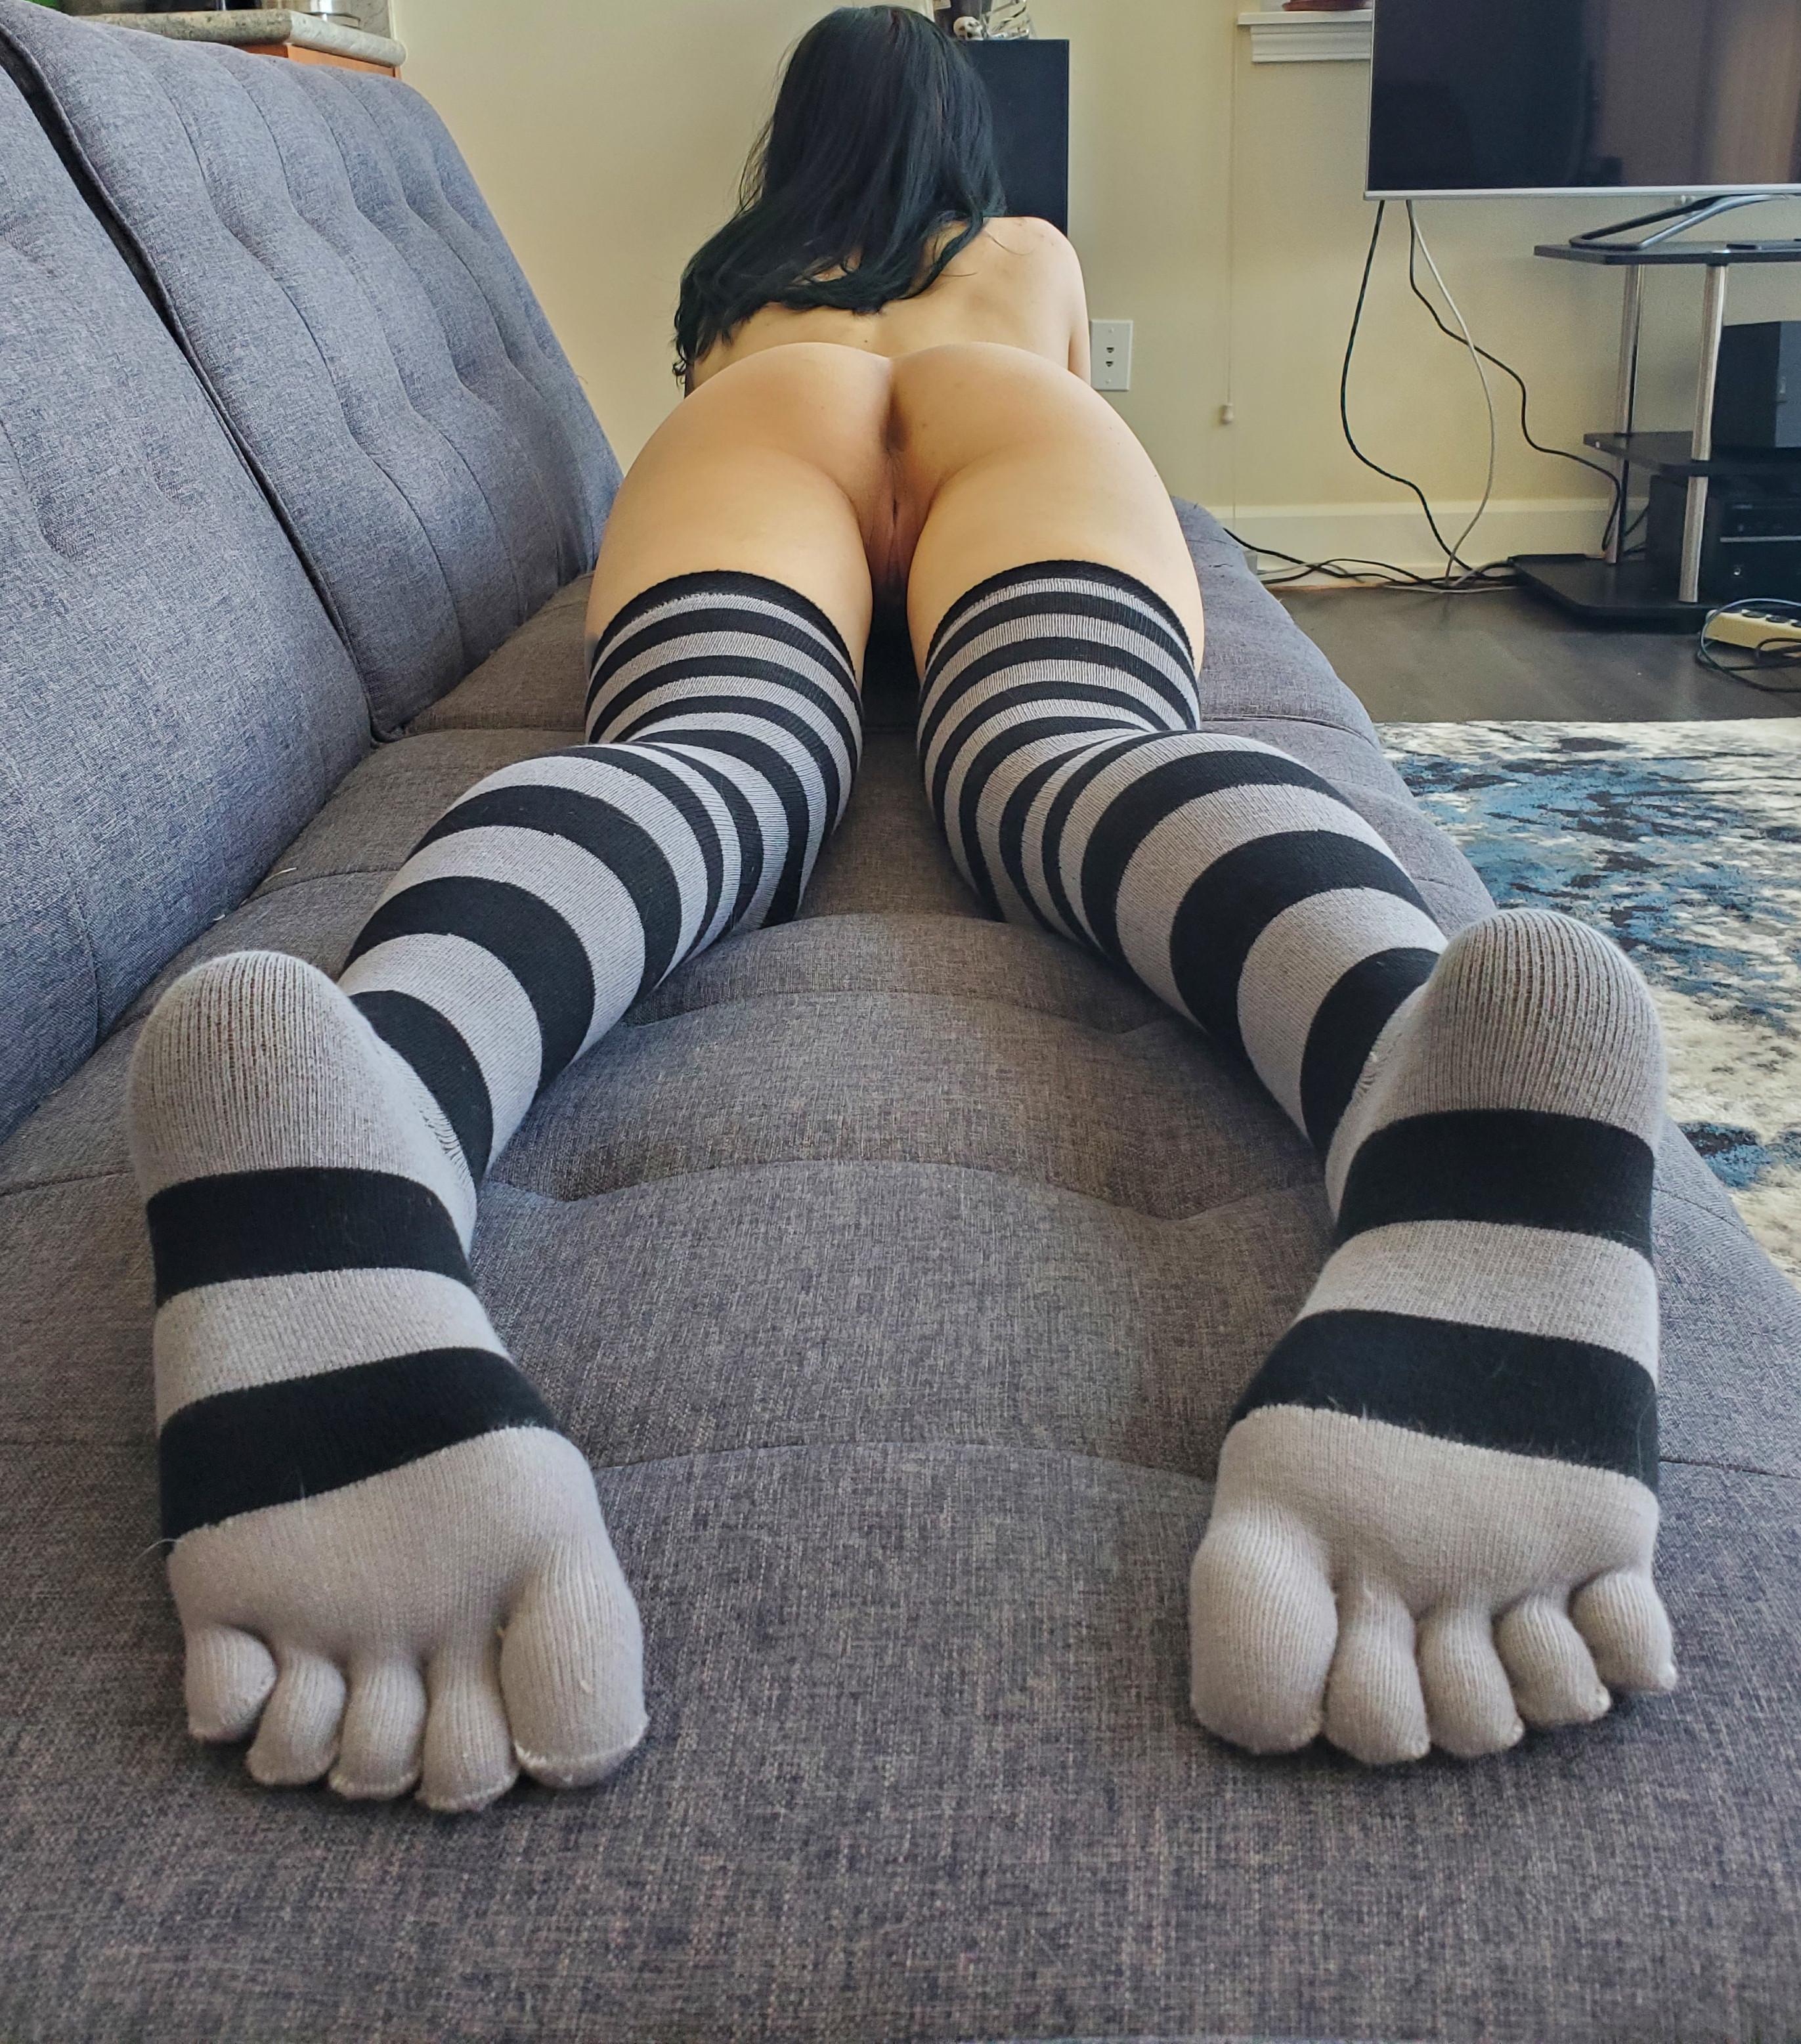 Sock Porn